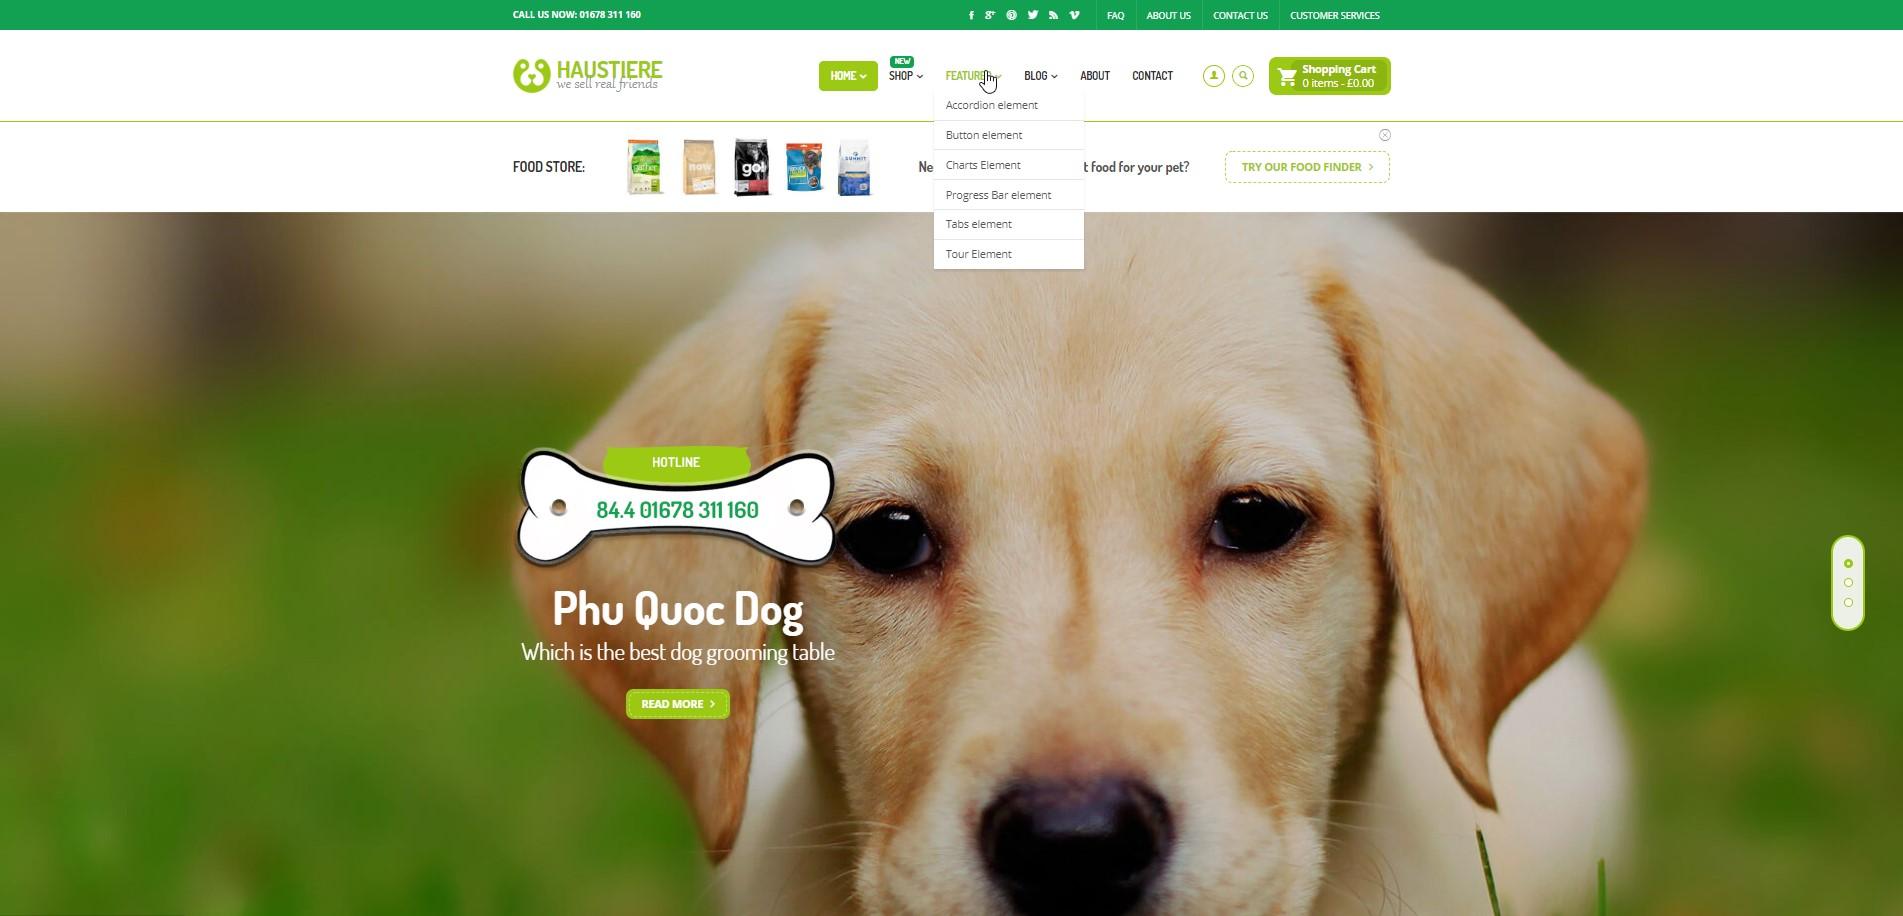 Haustiere - Pets Store RTL WooCommerce WordPress Theme